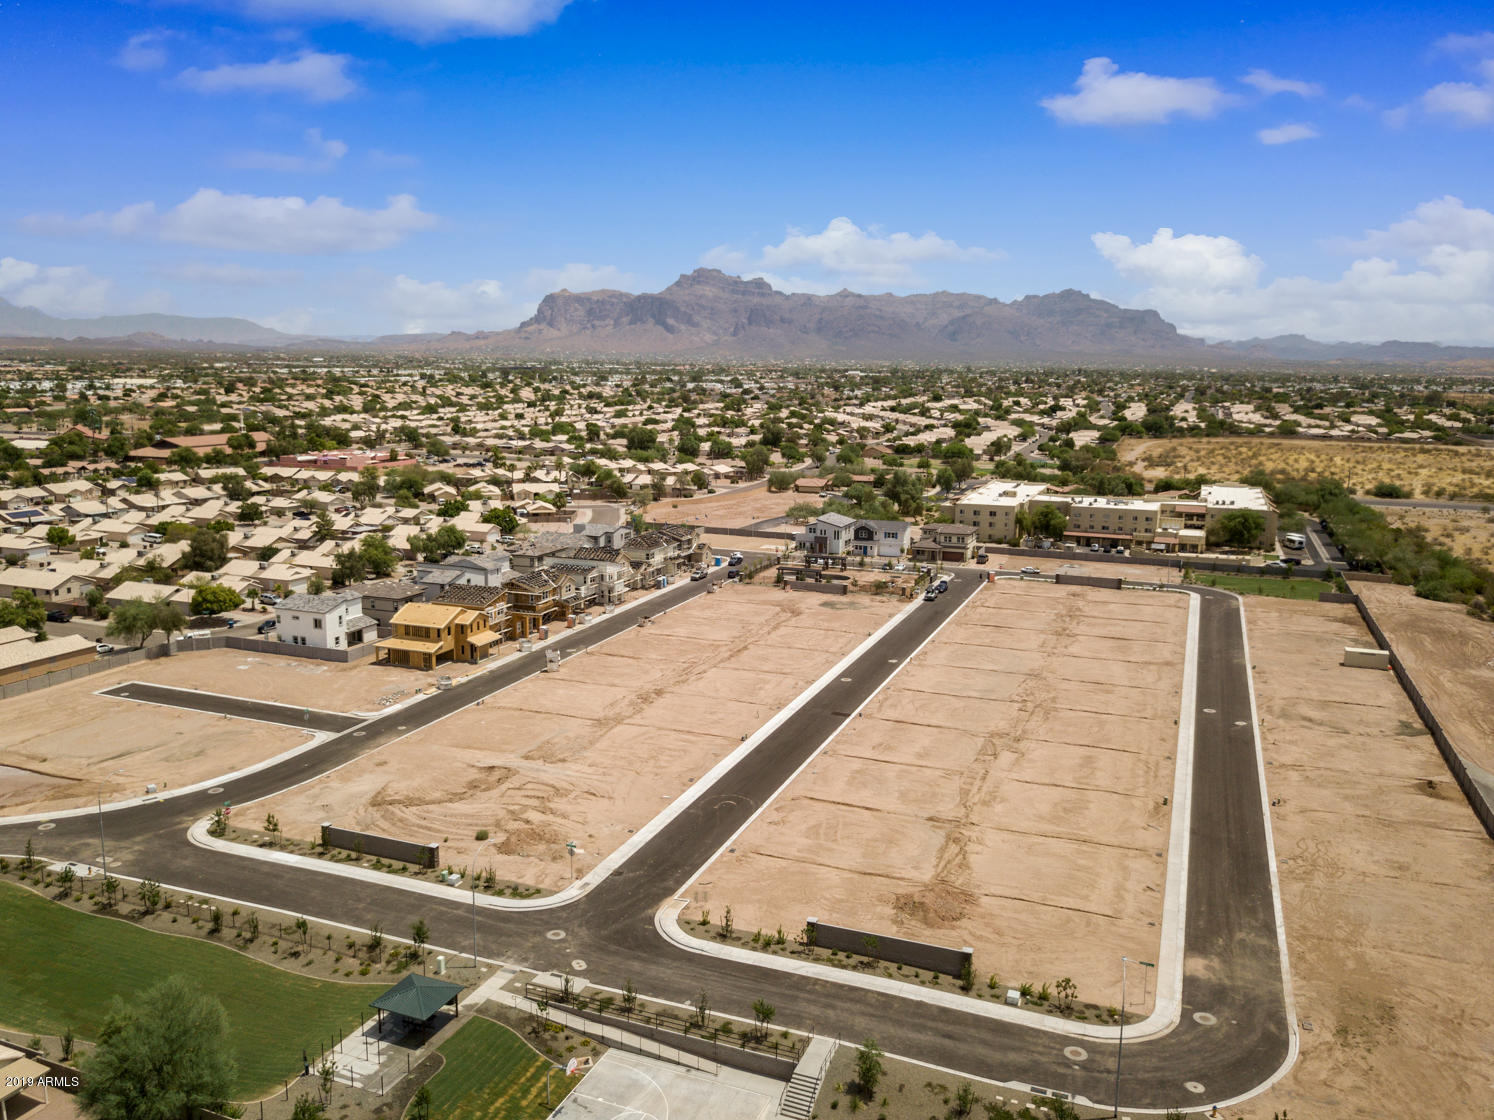 MLS 5921309 1851 W 20th Avenue, Apache Junction, AZ 85120 Apache Junction AZ Gated